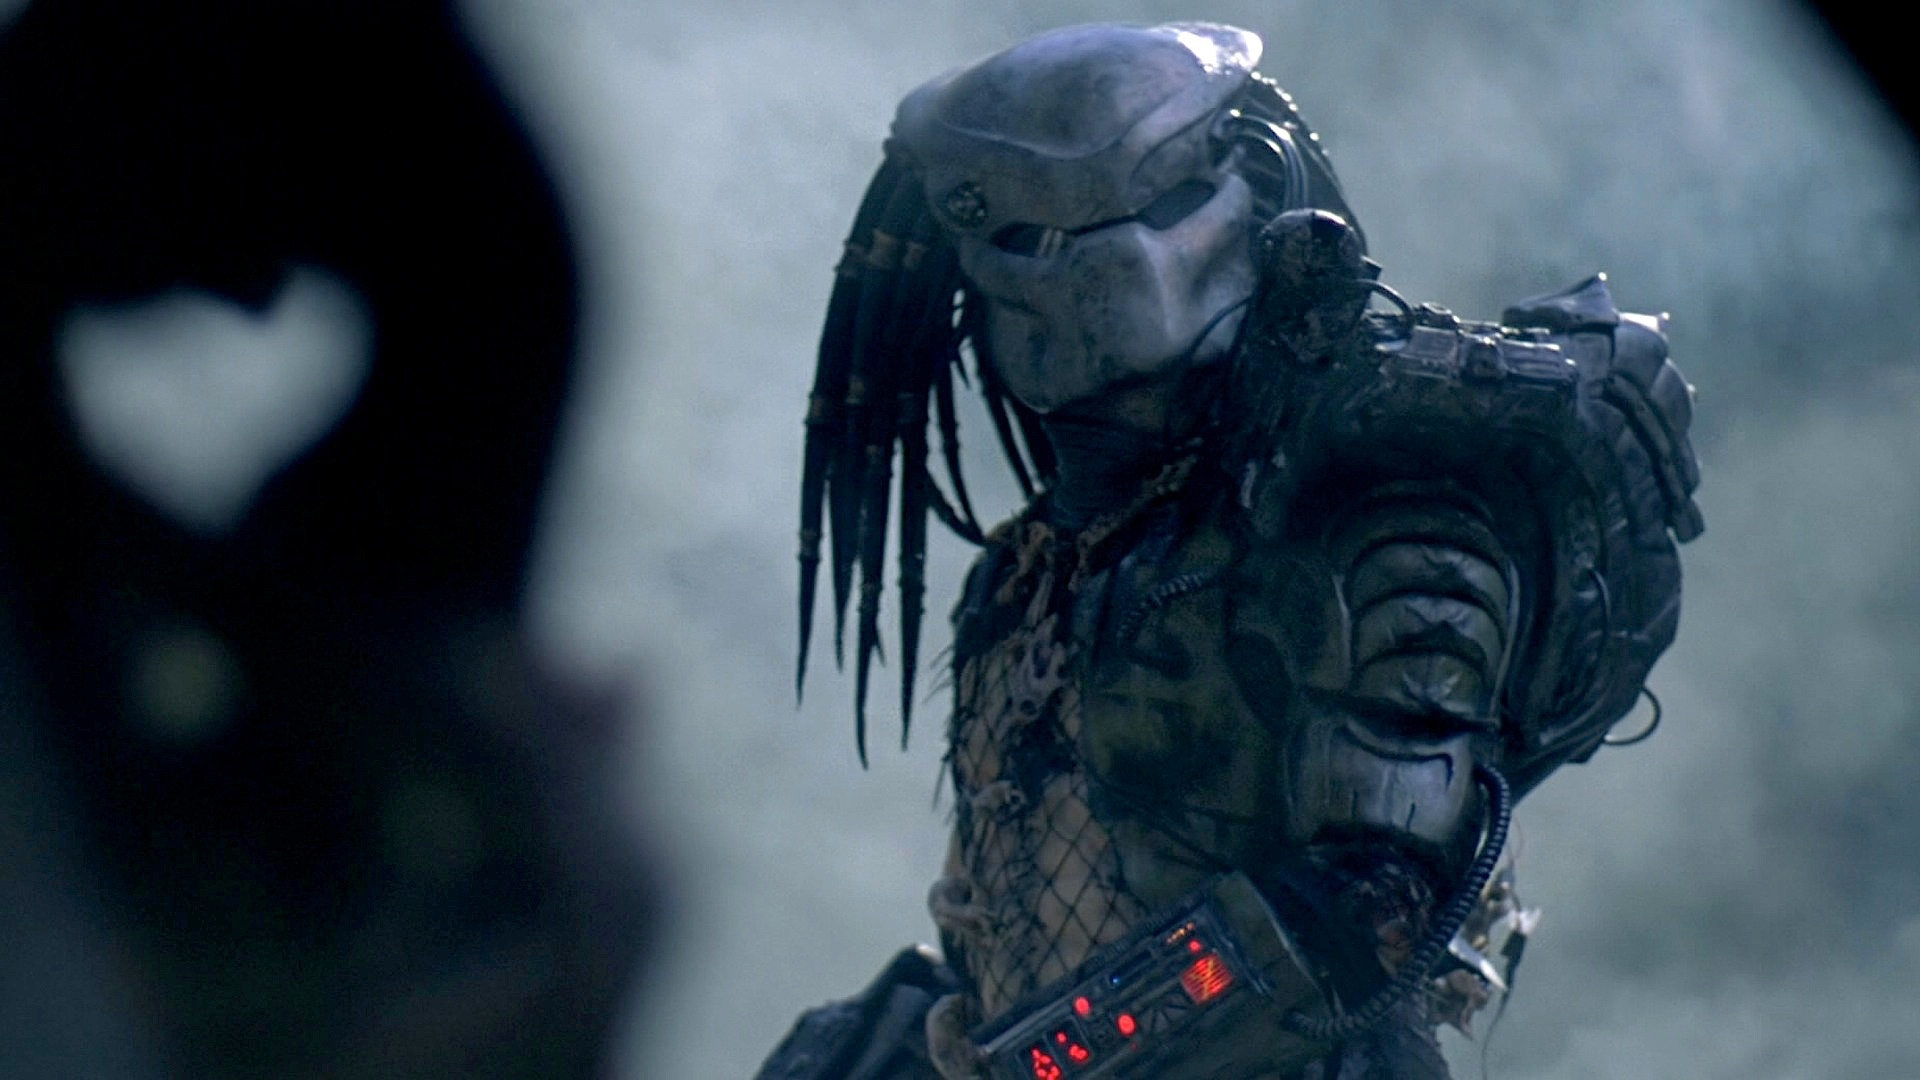 edward-james-olmos-says-shane-blacks-the-predator-is-a-funny-yet-deadly-film-social.jpg